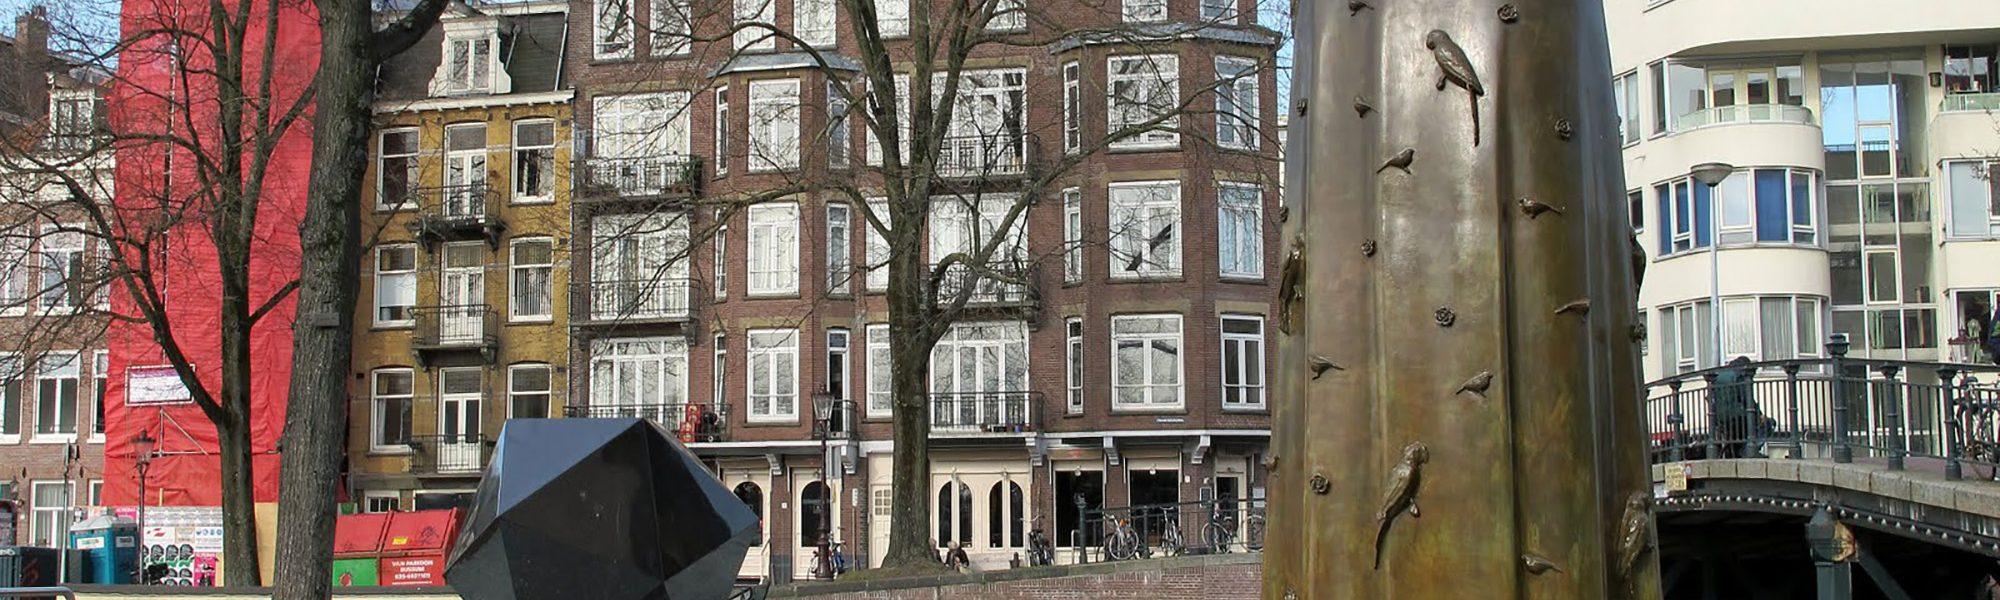 Amsterdam historia jueva 1